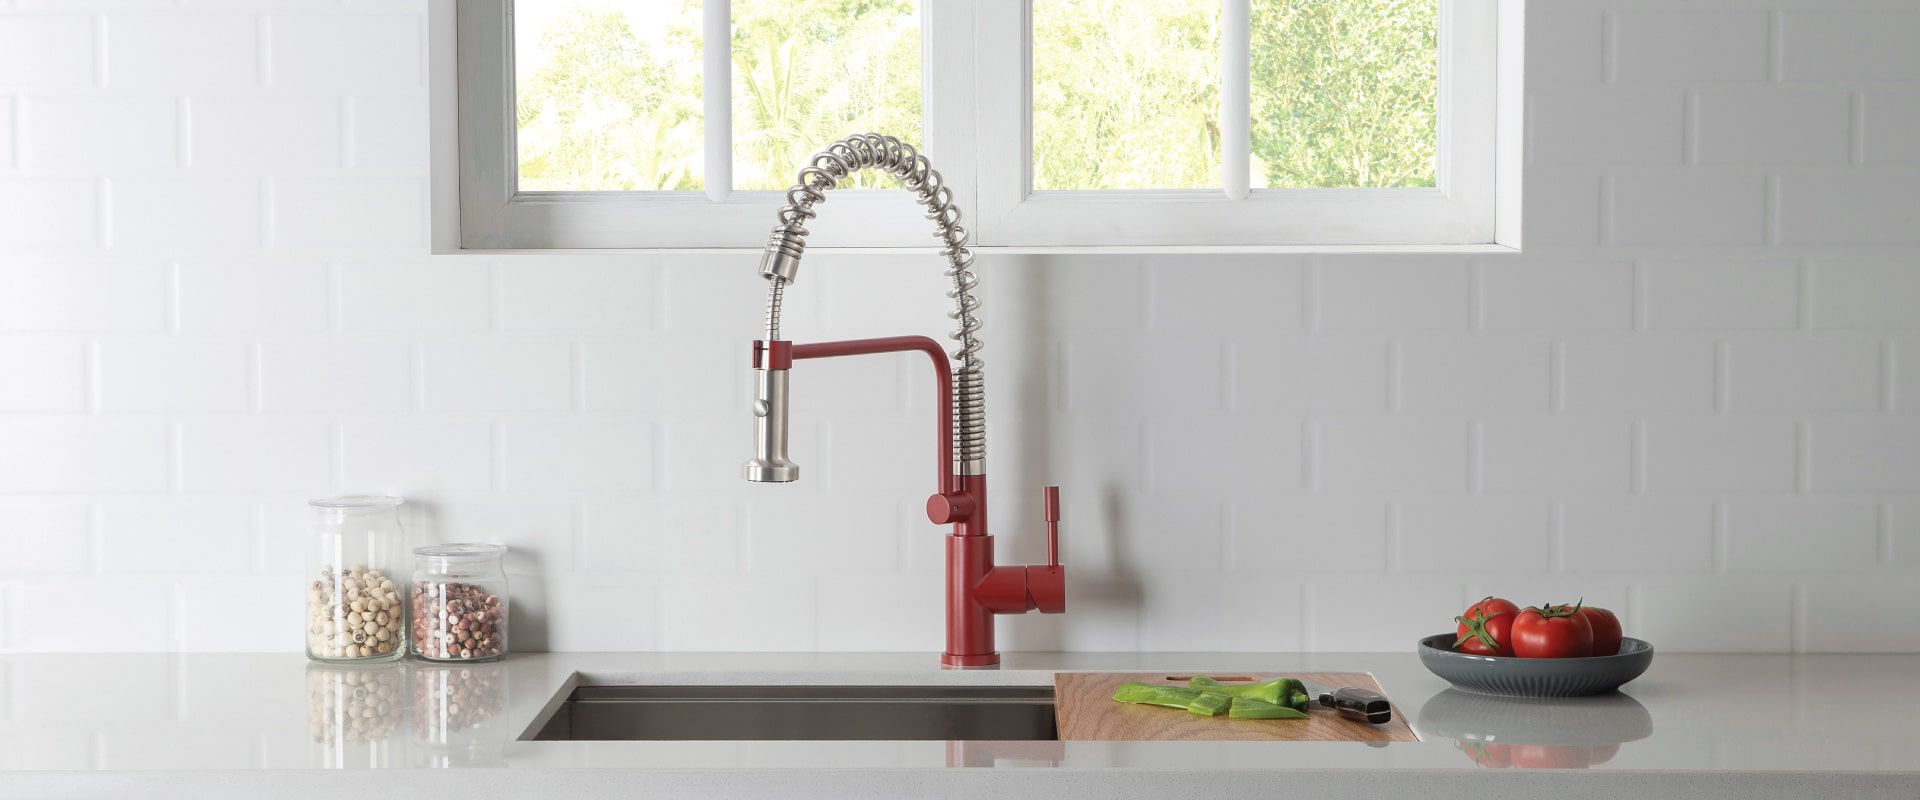 RM Living Contemporary Interior Design Cincinnati Faucet by Isenberg Isenberg4